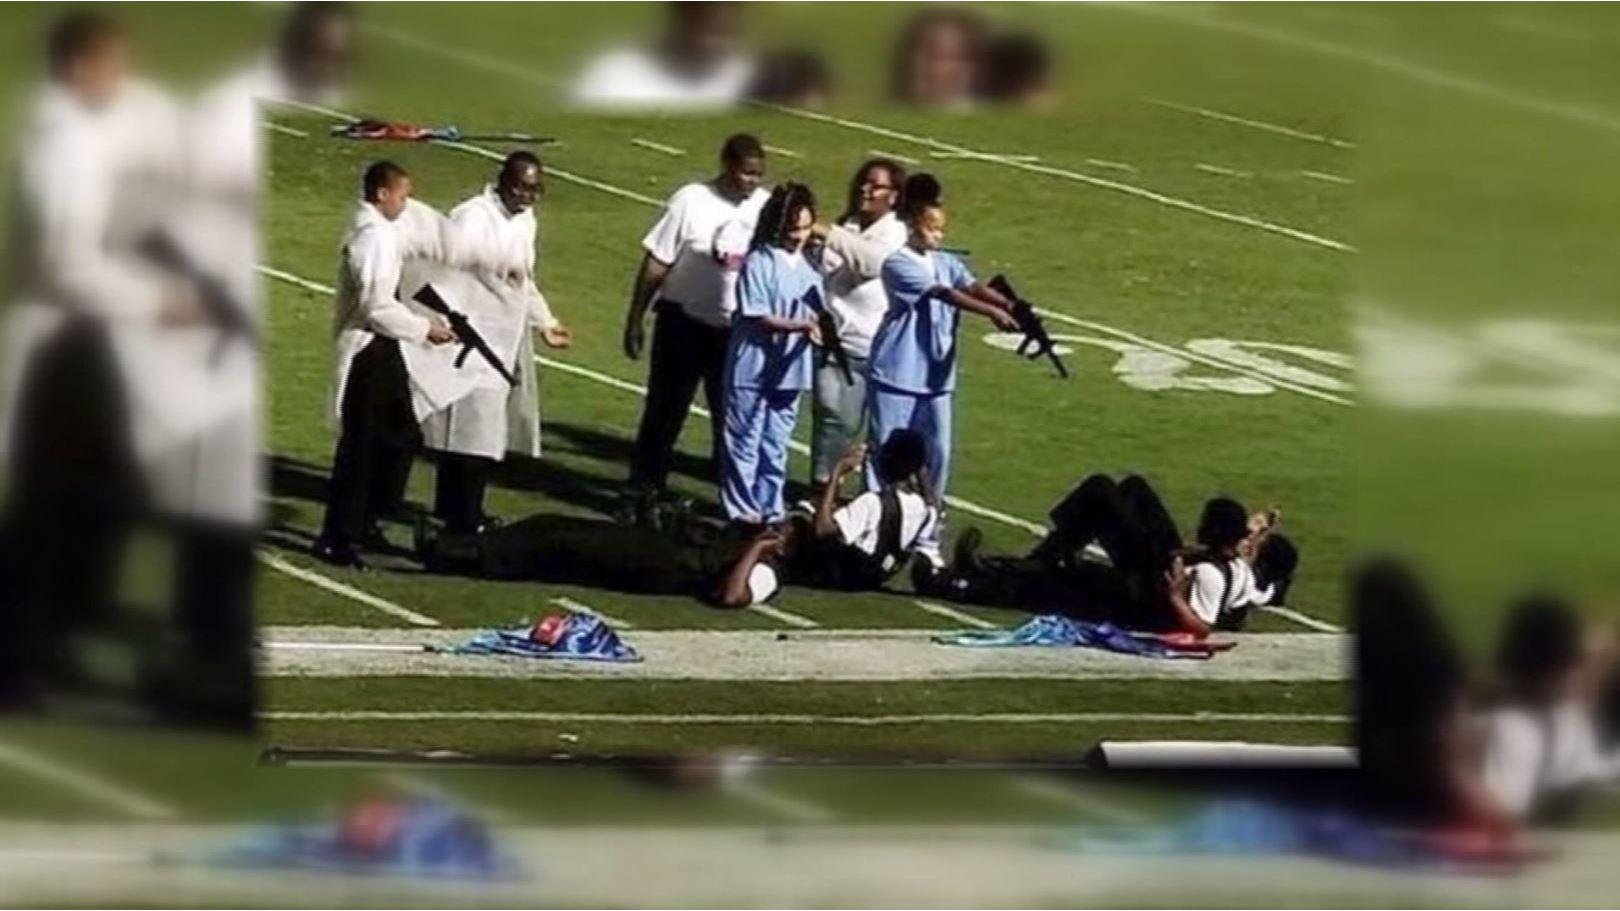 Mississippi high school band director suspended after